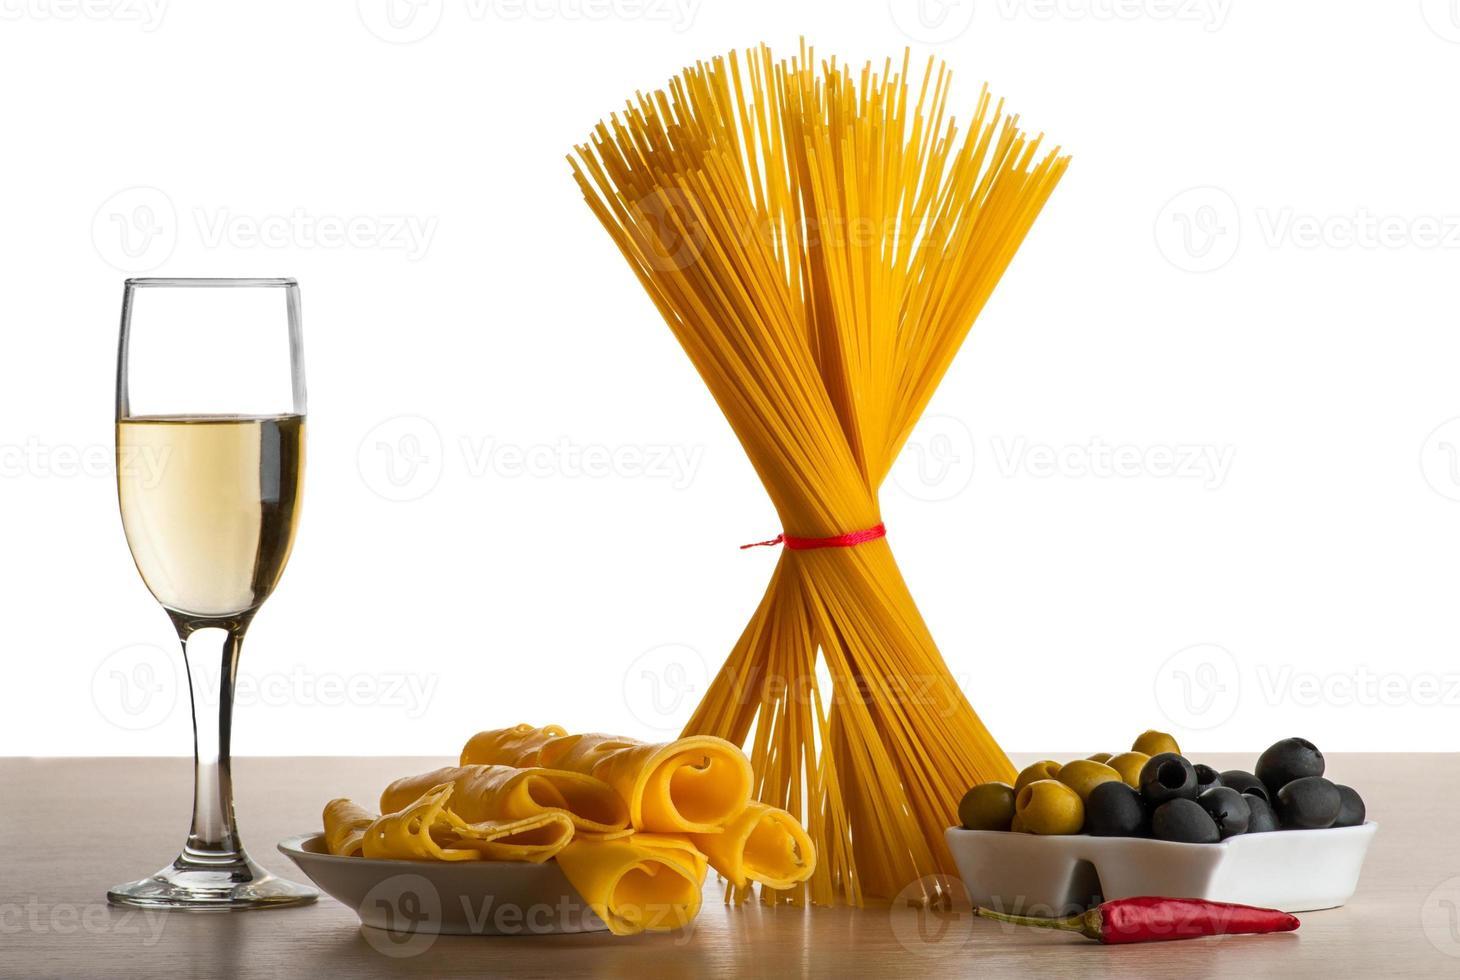 espaguete, azeitonas, pimenta e vinho branco, isolado no branco foto